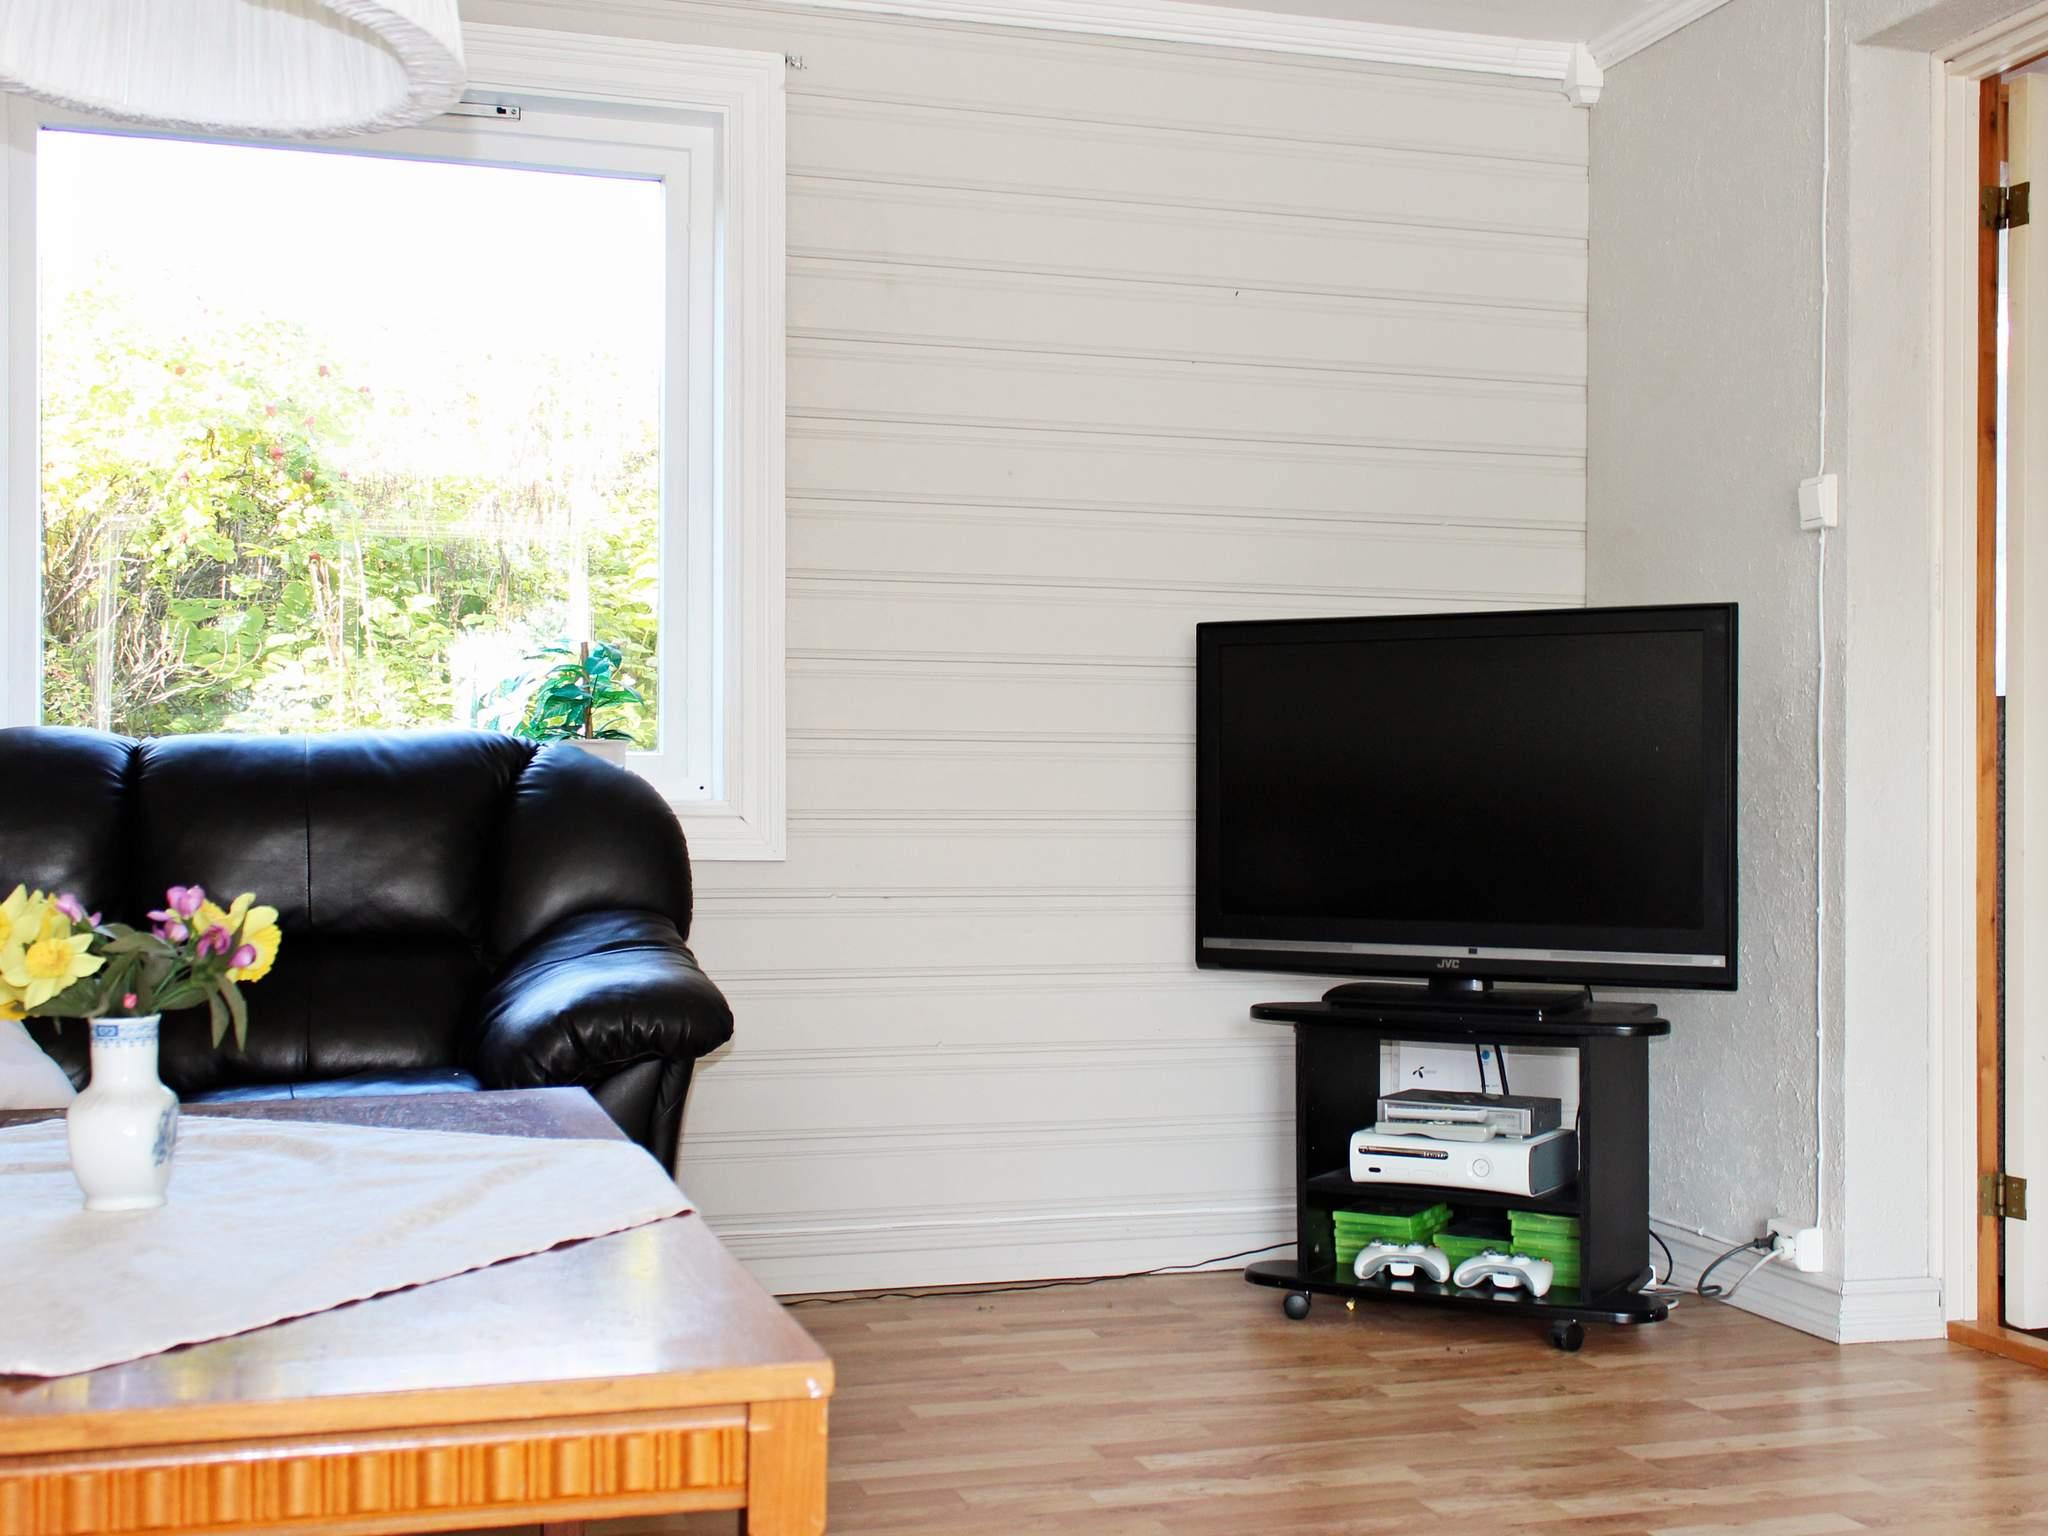 Ferienhaus Vevang (85080), Vevang, More - Romsdal, Westnorwegen, Norwegen, Bild 50